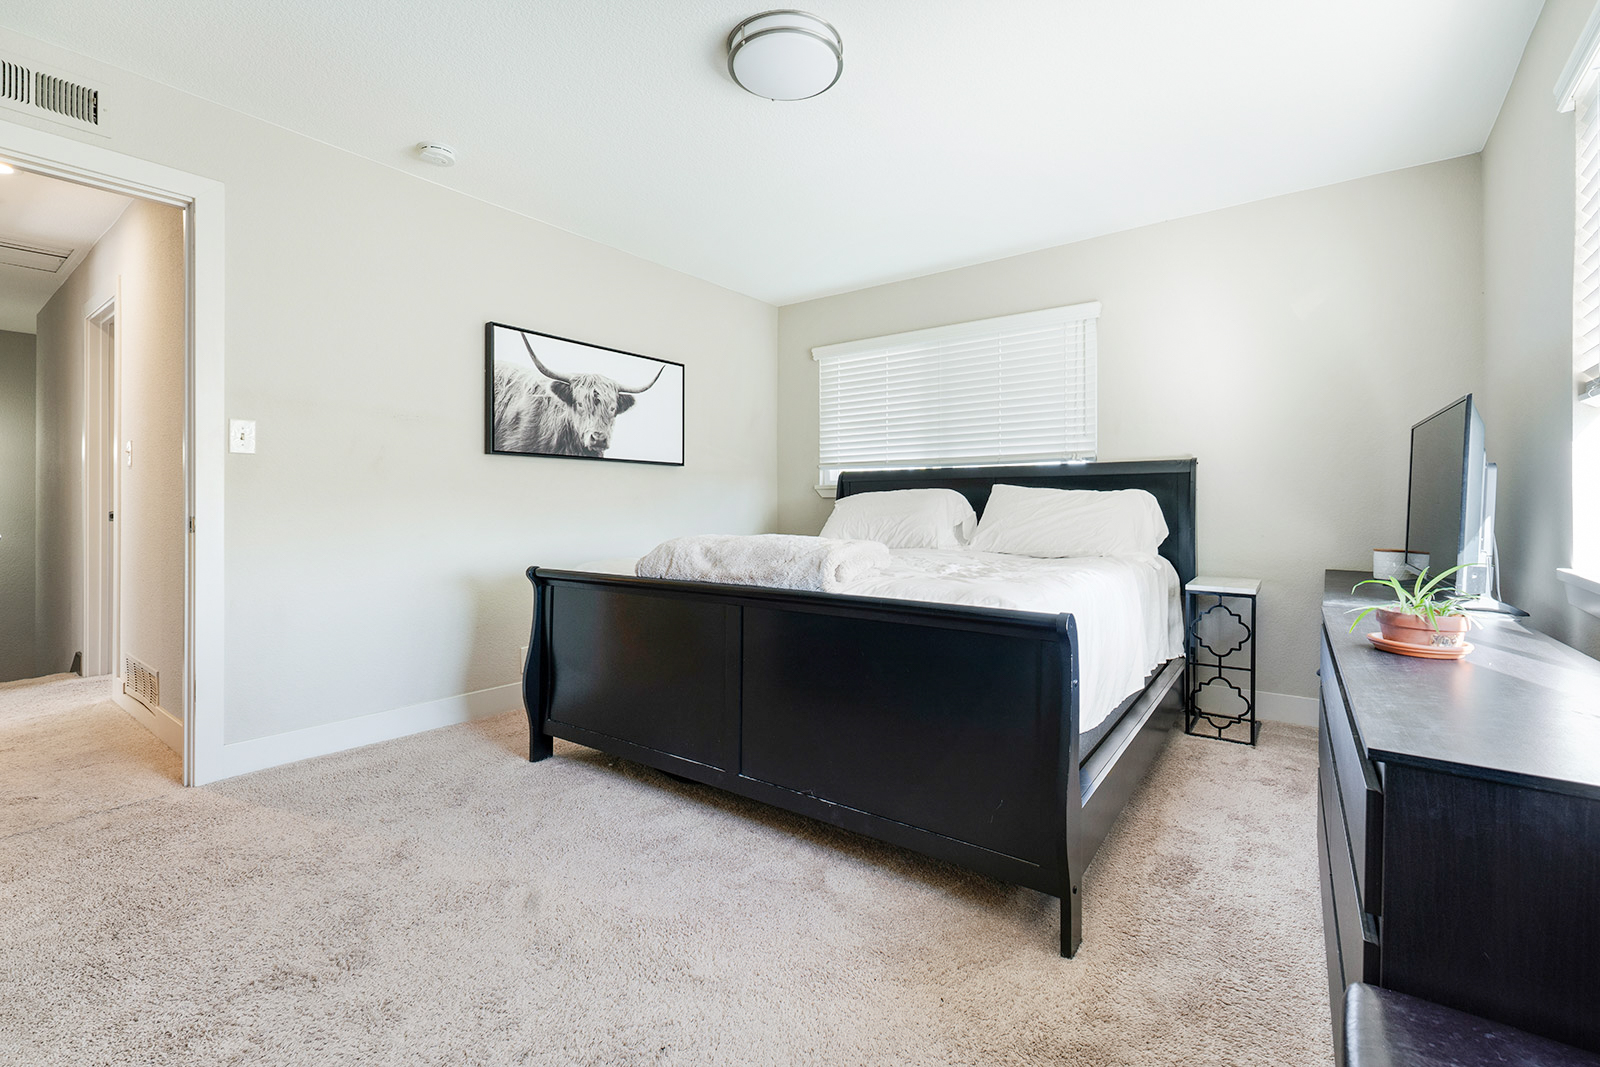 Master bedroom of home at 6235 Everest Way, Sacramento, Ca